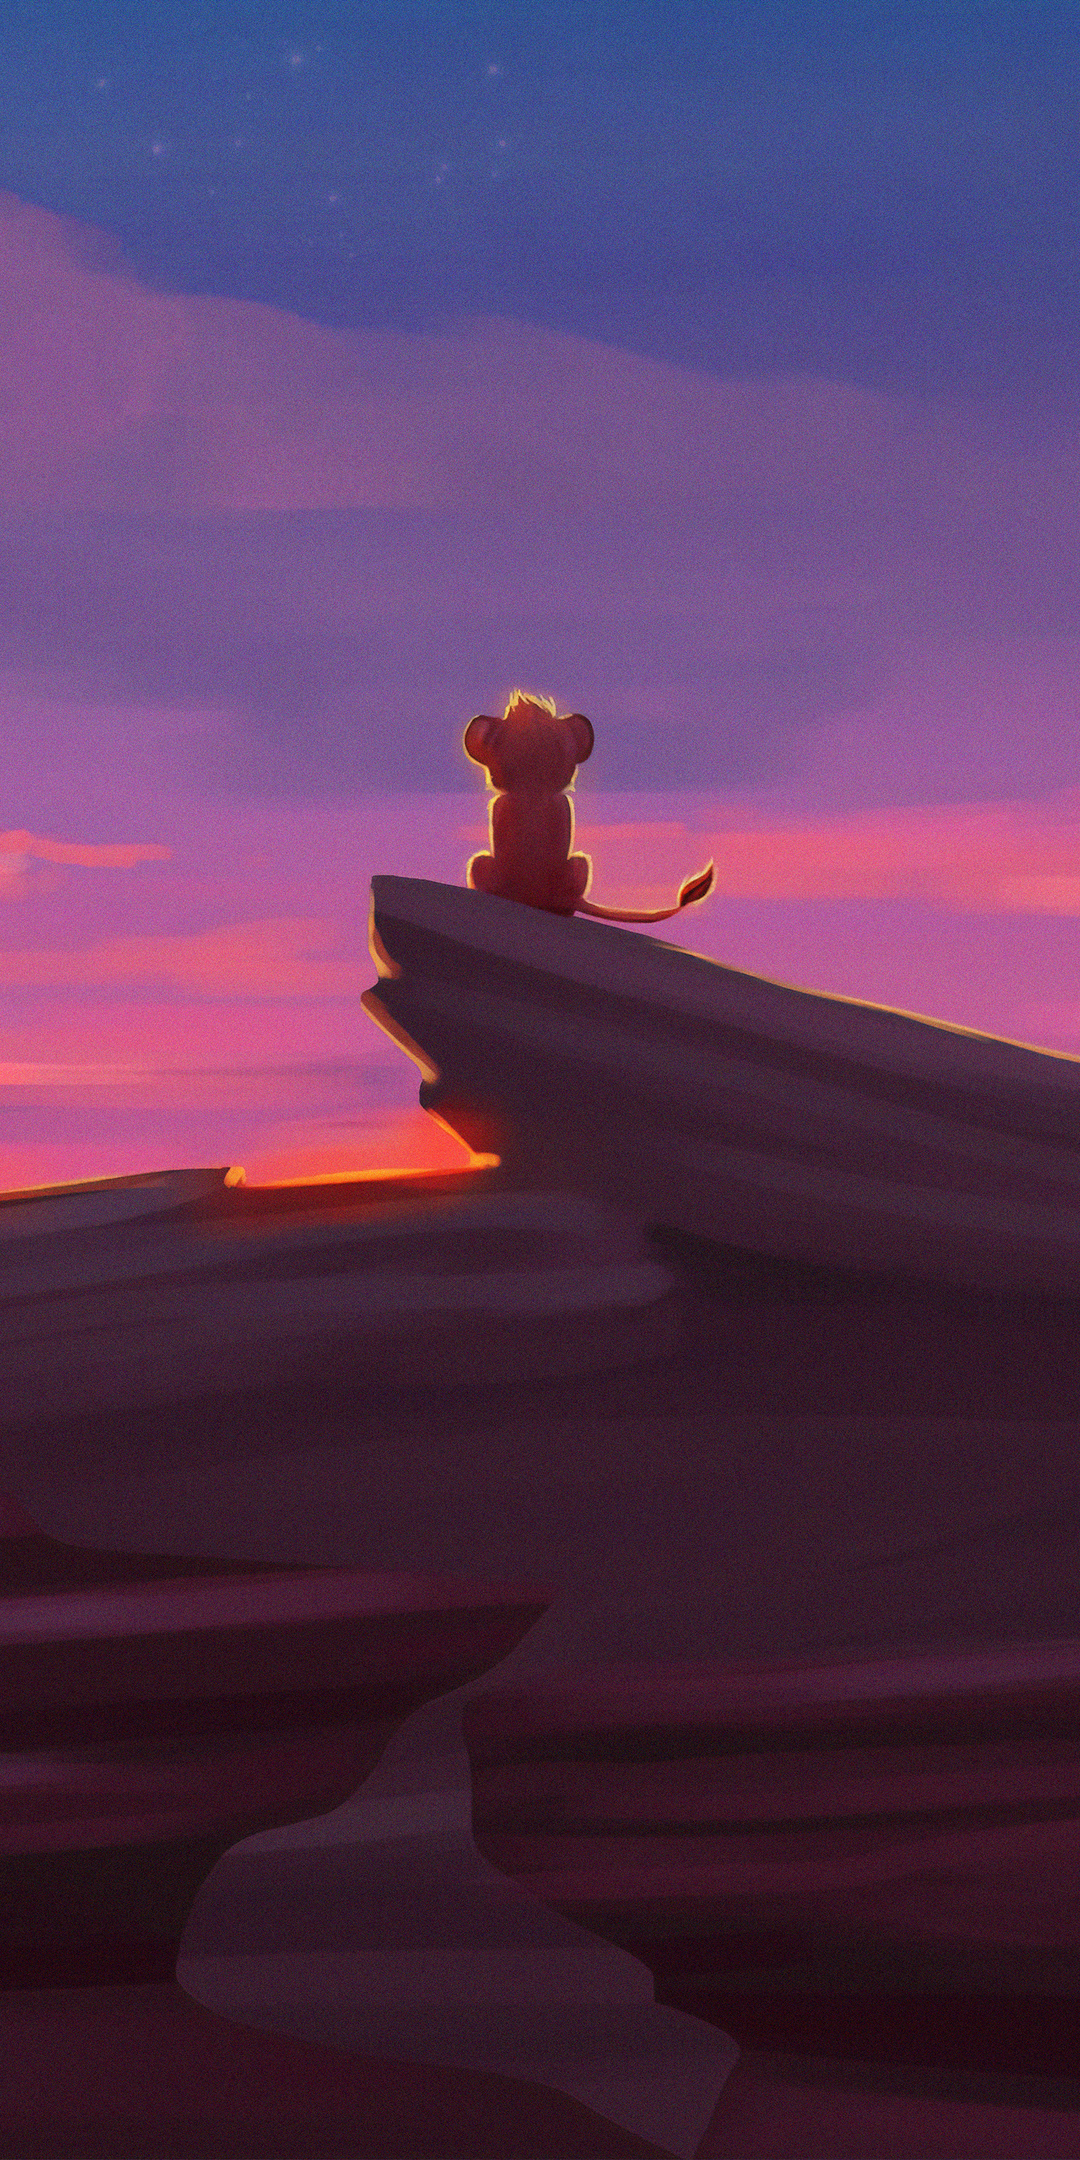 simba-the-lion-king-bp.jpg